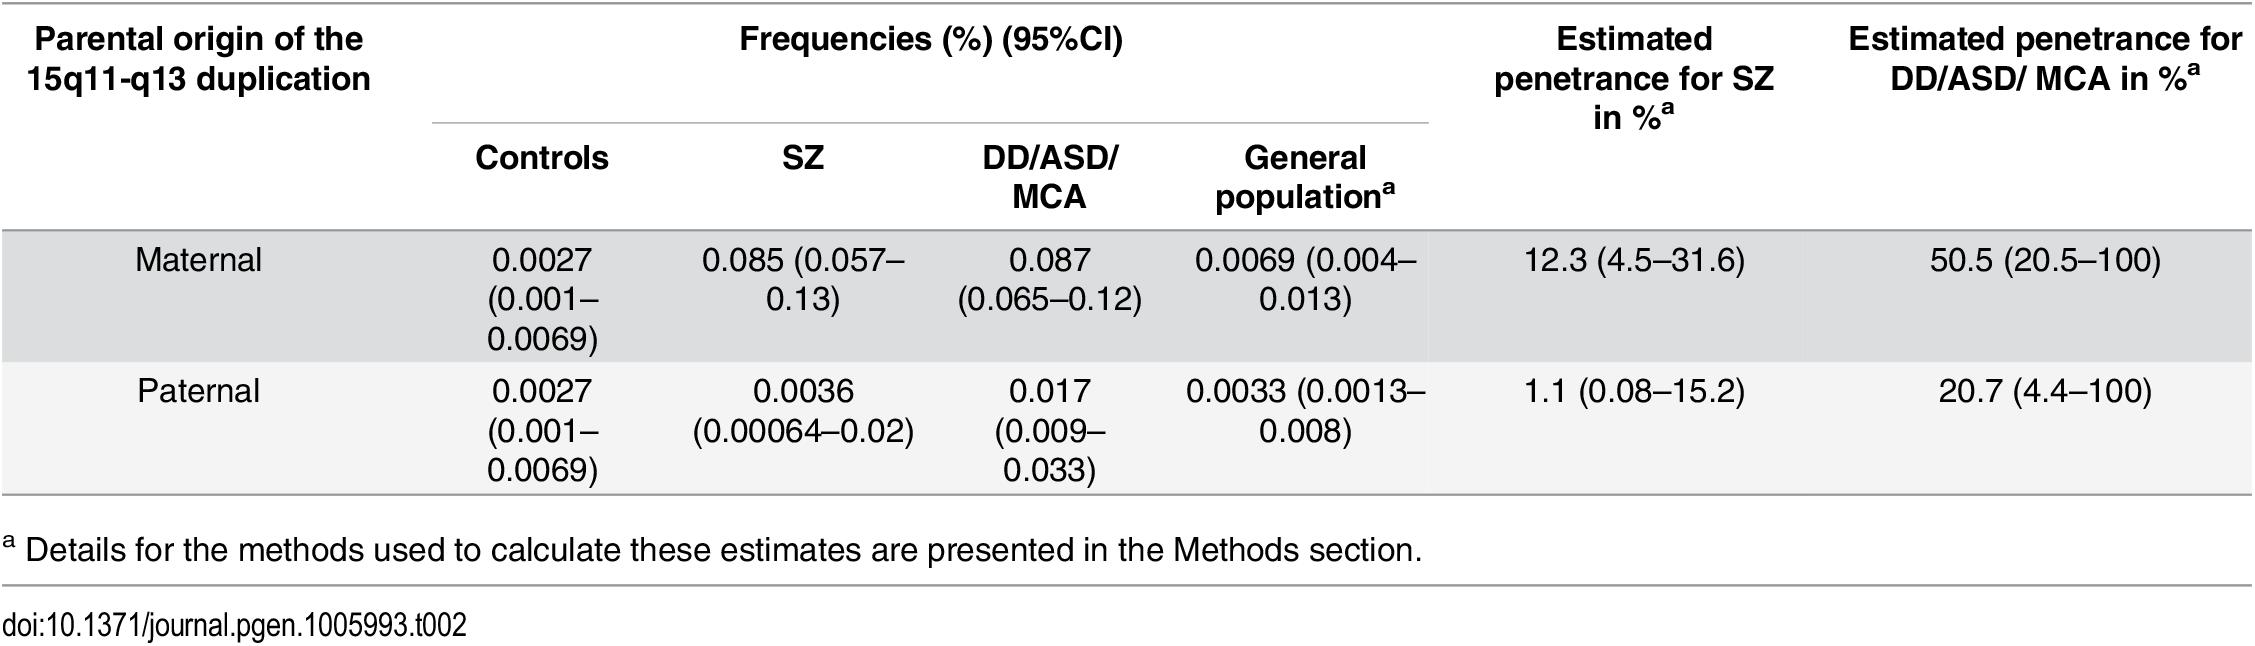 Penetrance estimates for the 15q11.2-q13.3 duplication.